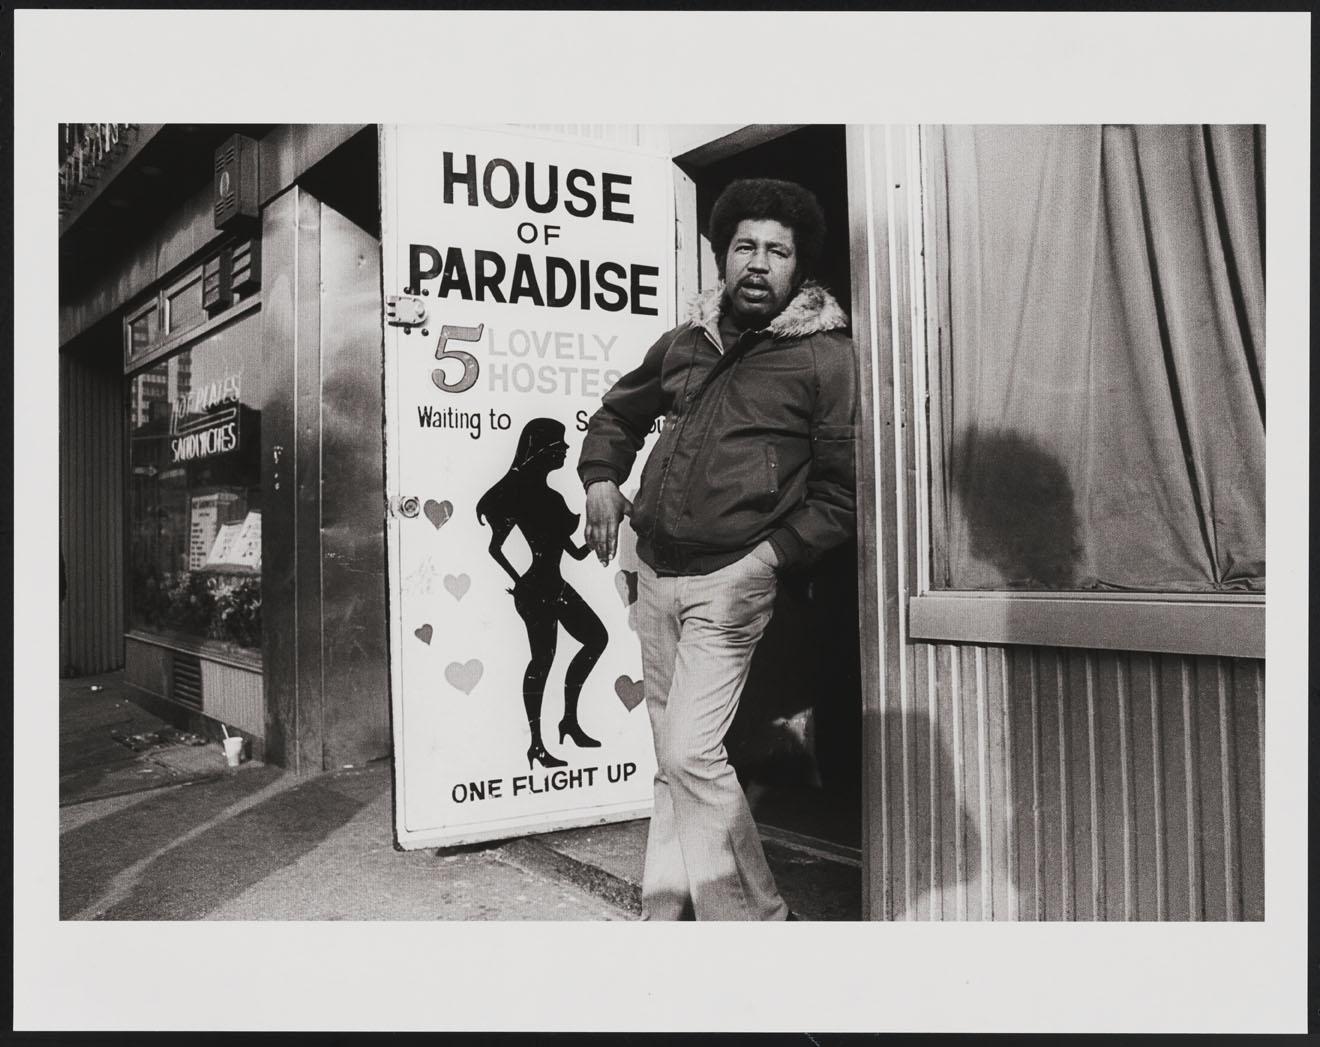 Leland Bobbé, Casa del Paraíso, Times Square, 1976